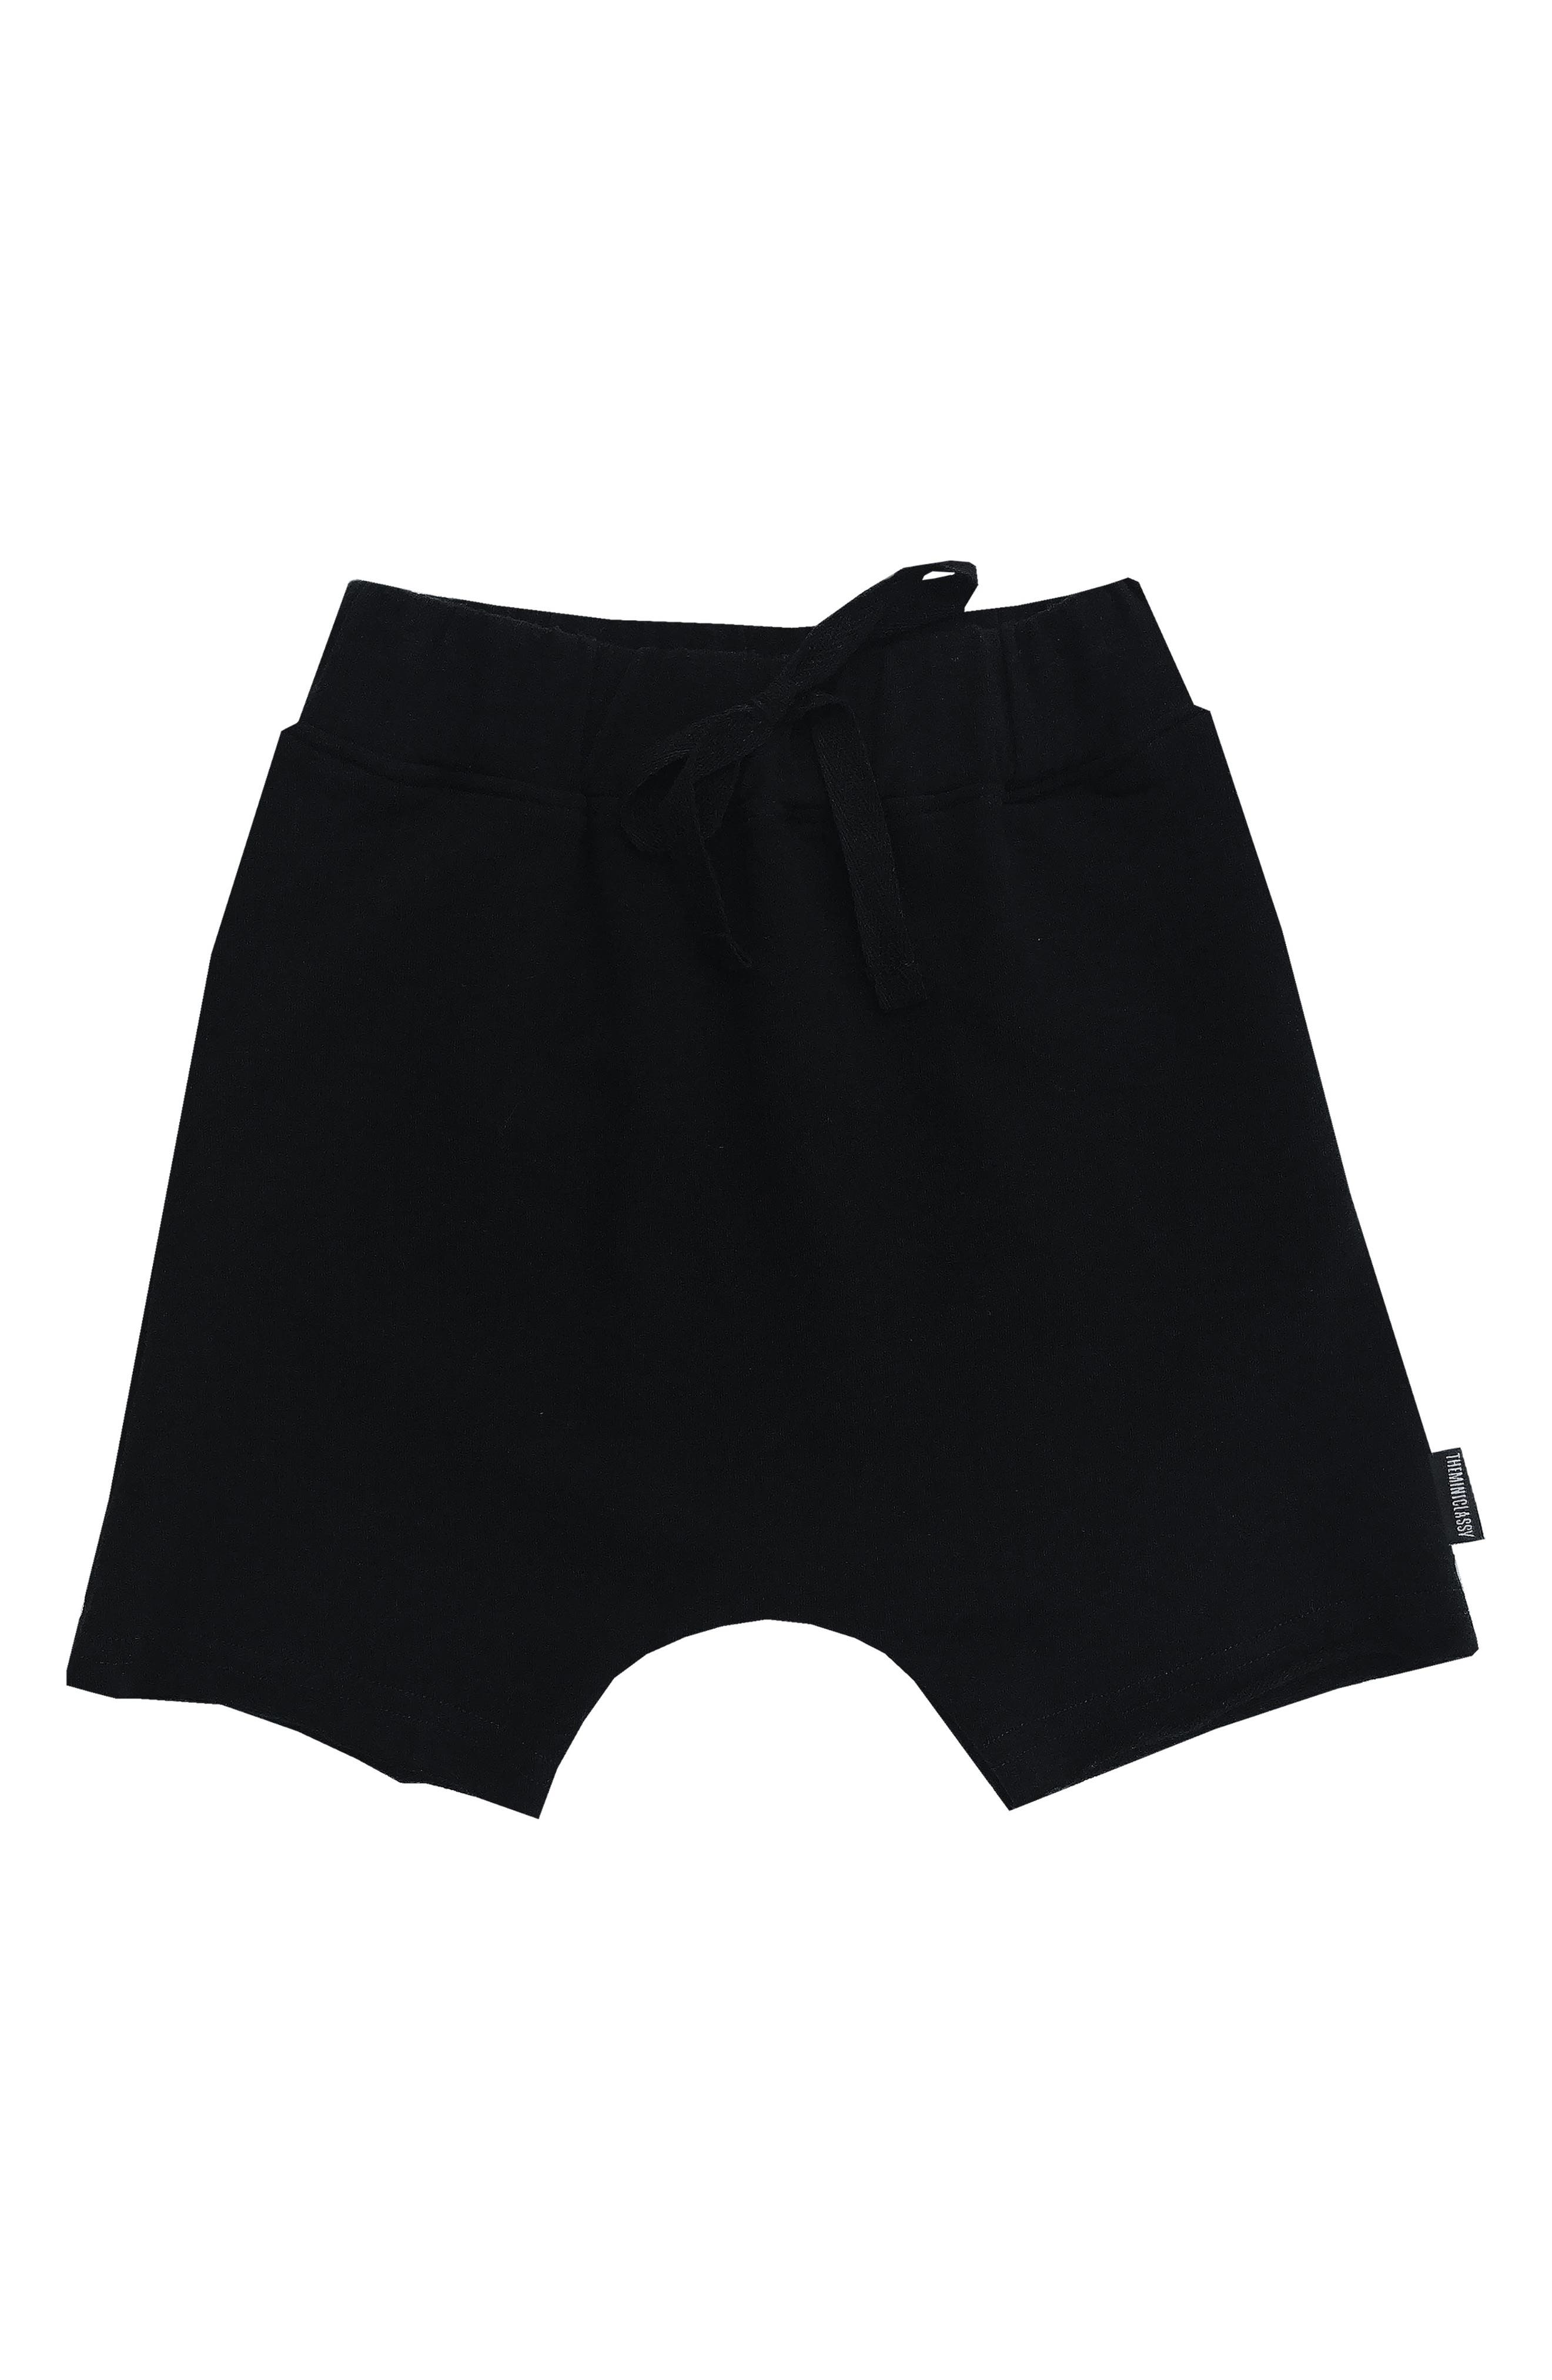 Main Image - THEMINICLASSY Drawstring Harem Shorts (Toddler Boys & Little Boys)